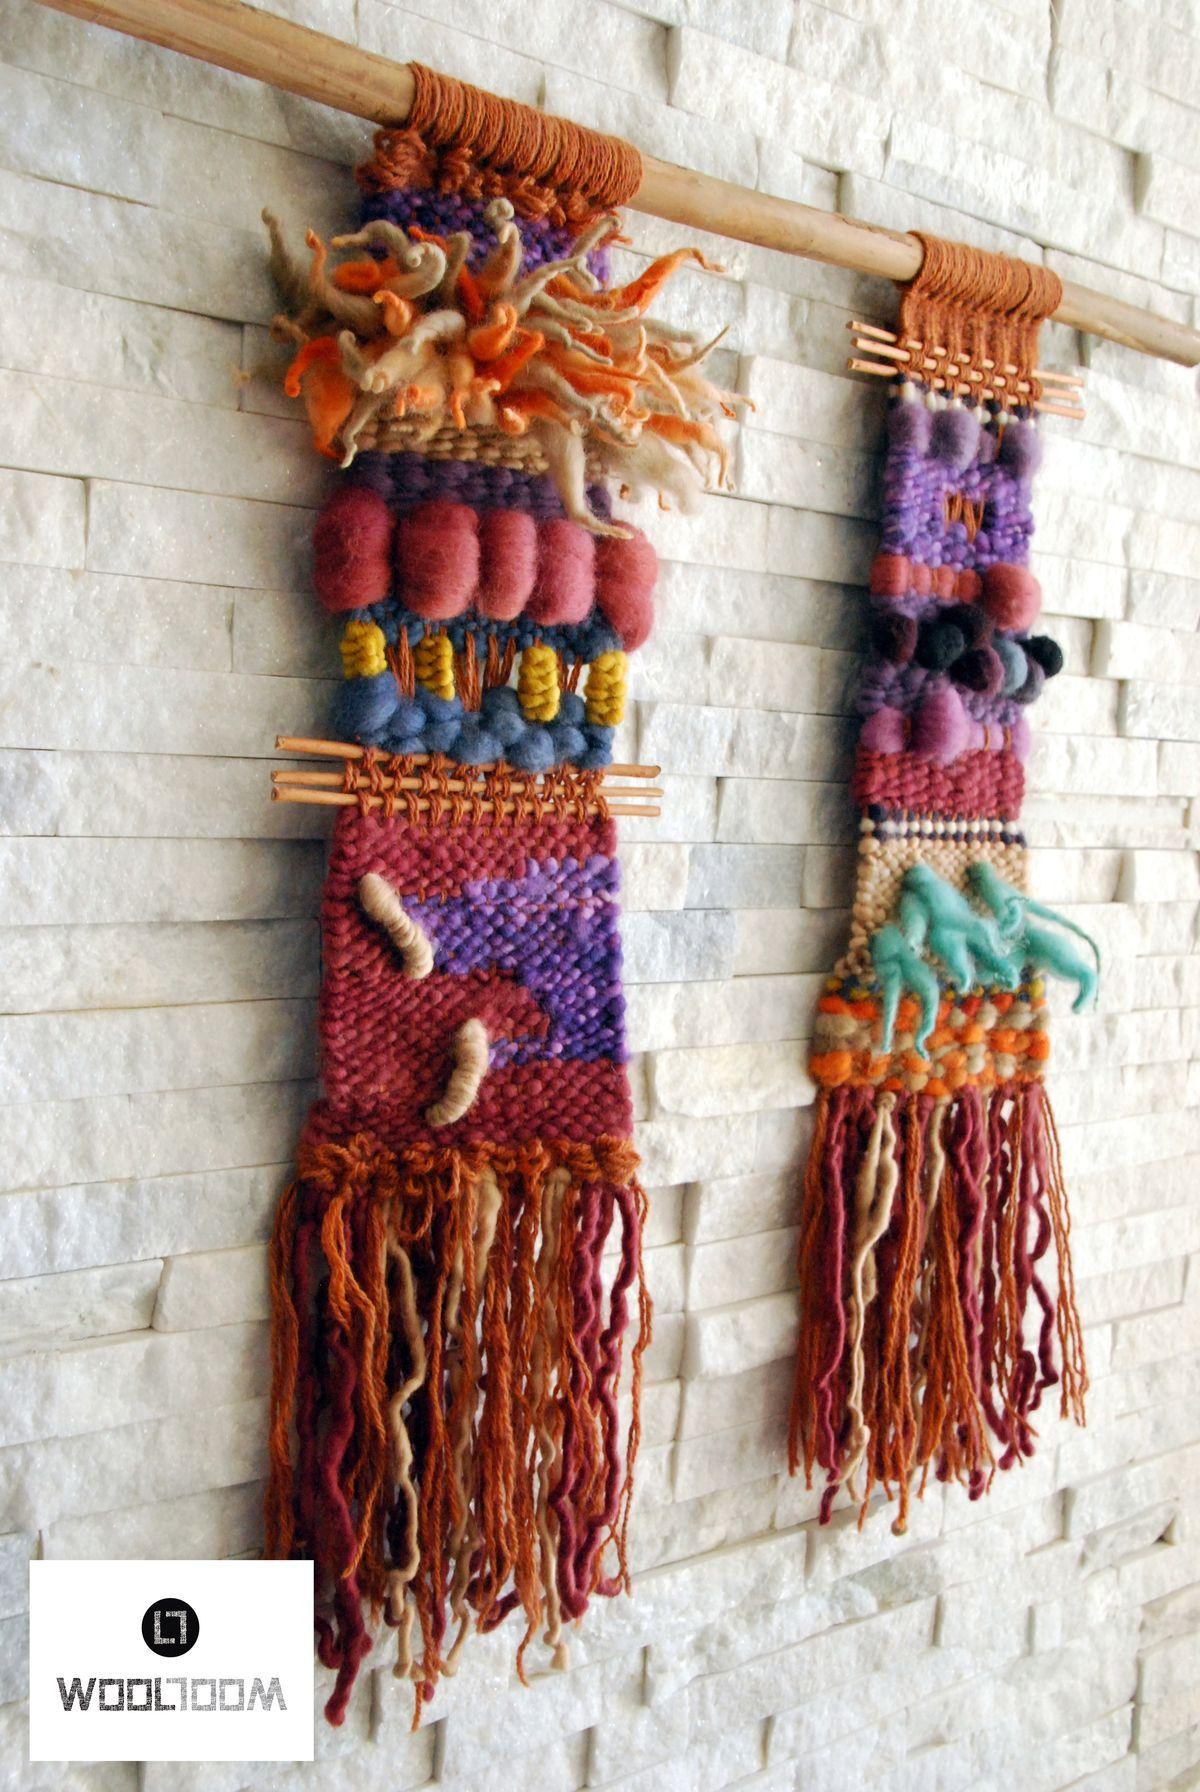 Hand Woven Wall Hanging Weaving Telar